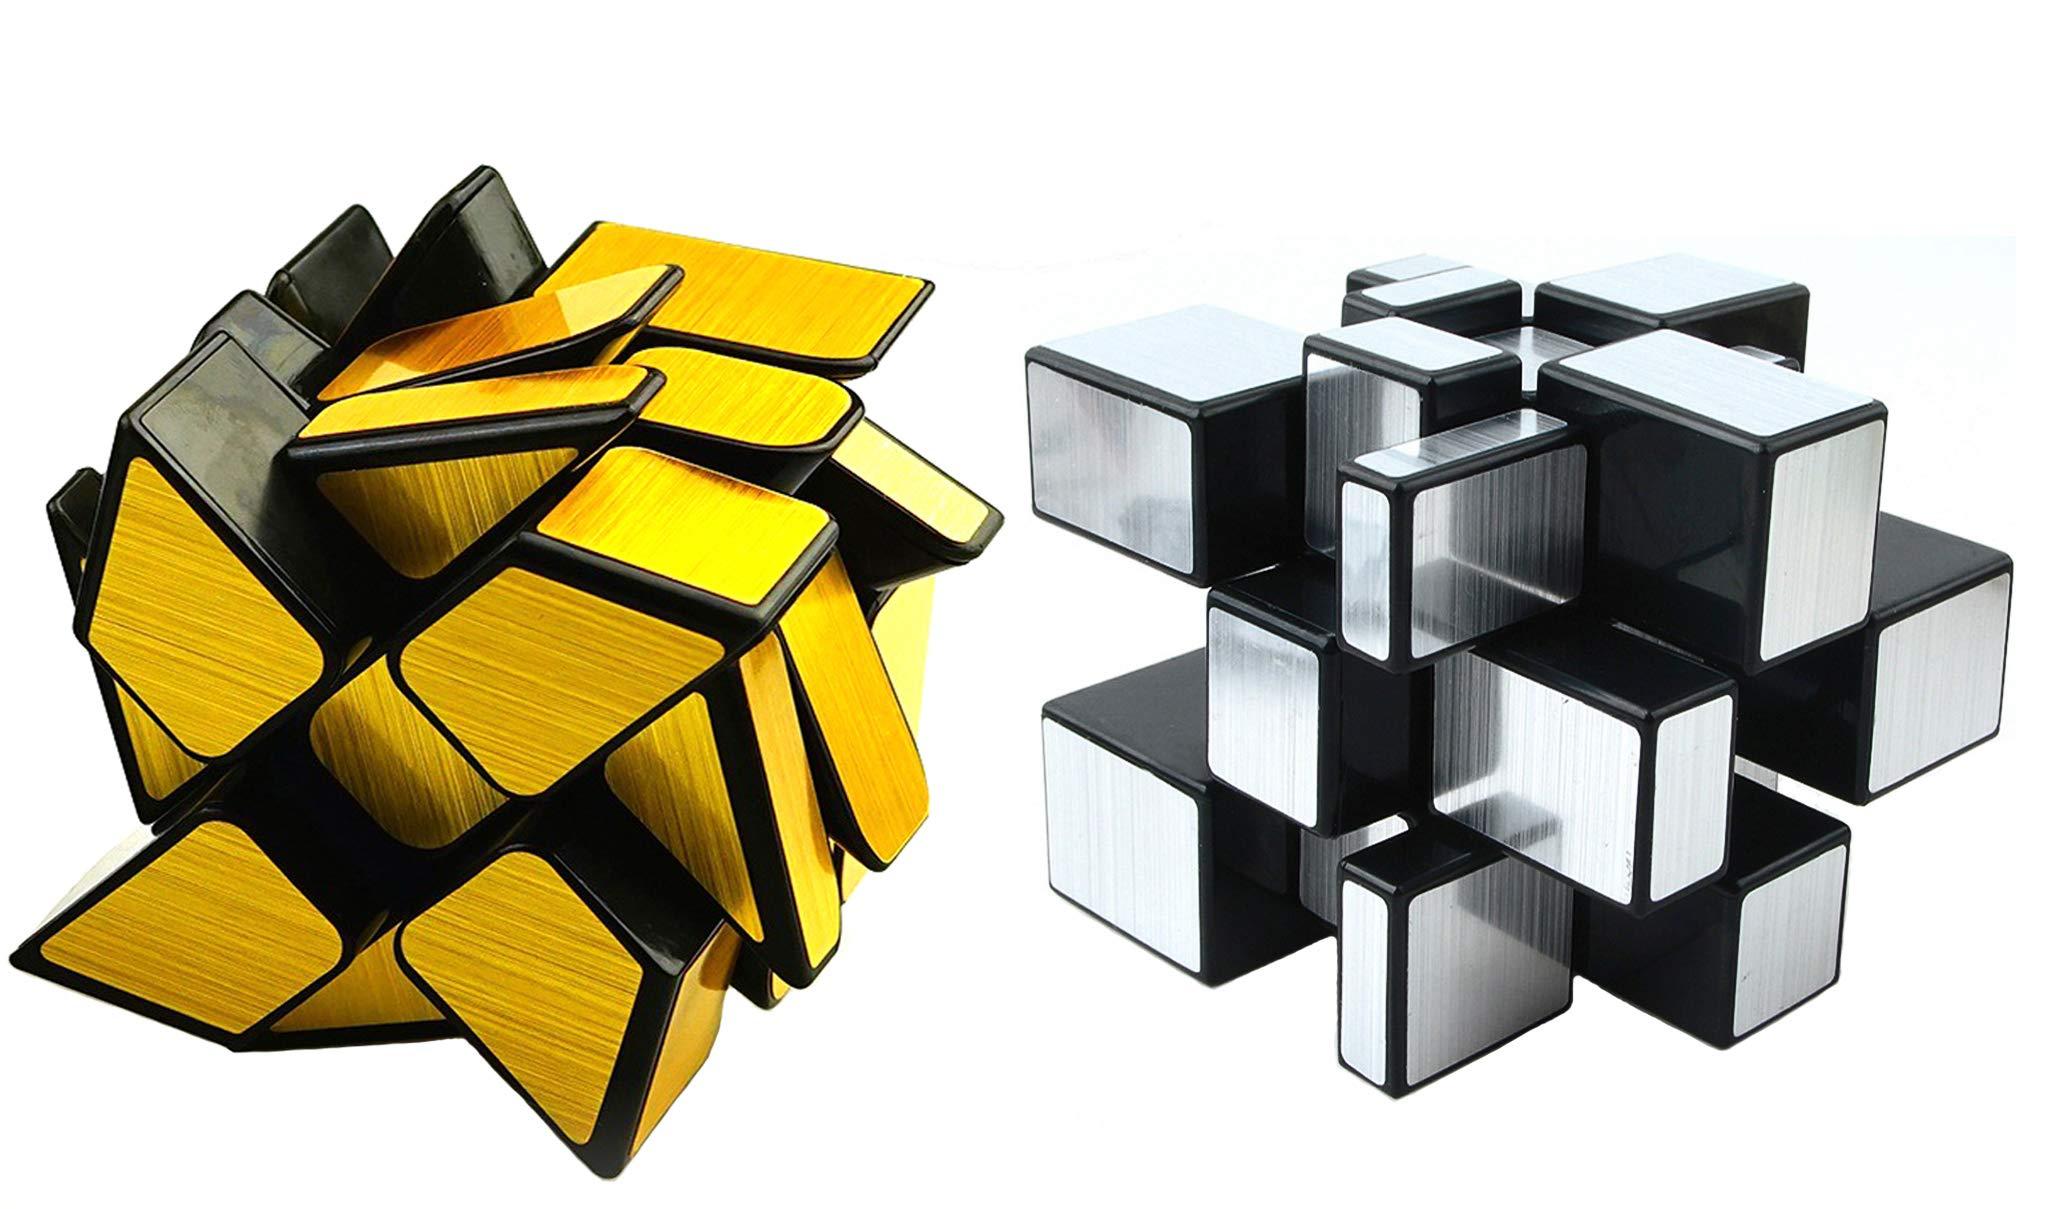 Mirror Speed Cube Set 2 Pack Of 3x3 Mirr Buy Online In Cambodia At Desertcart